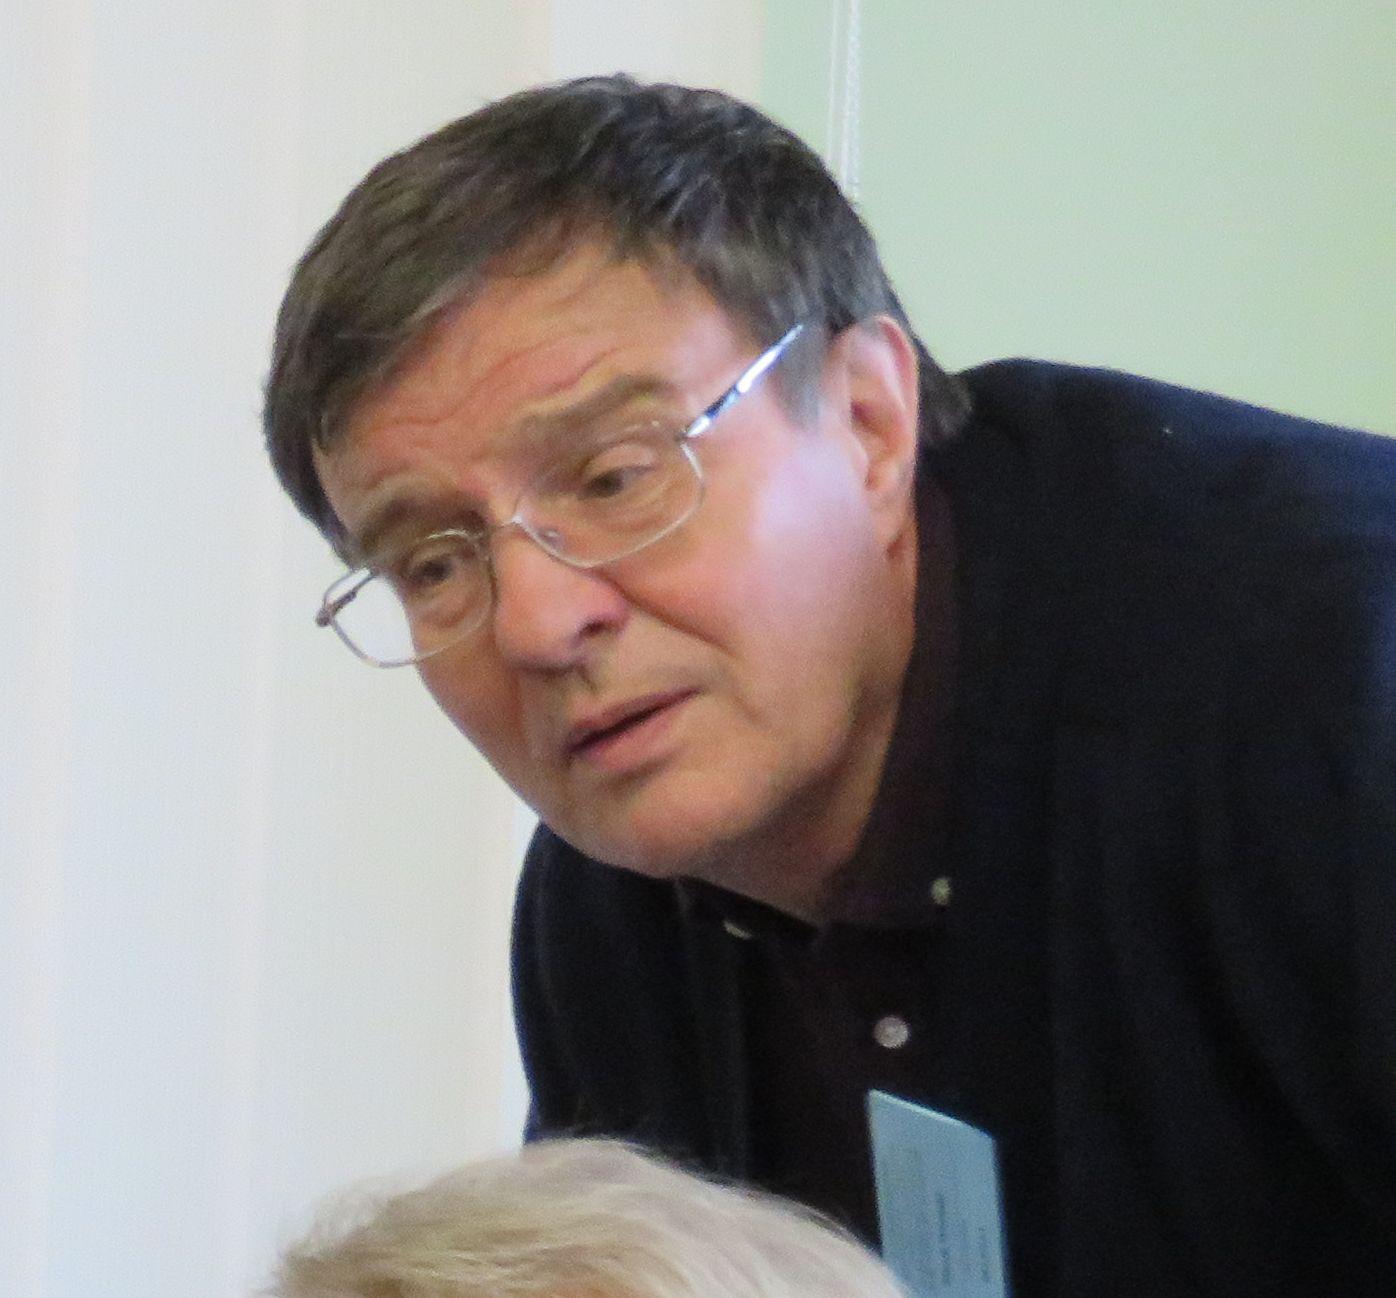 Marek Wroński